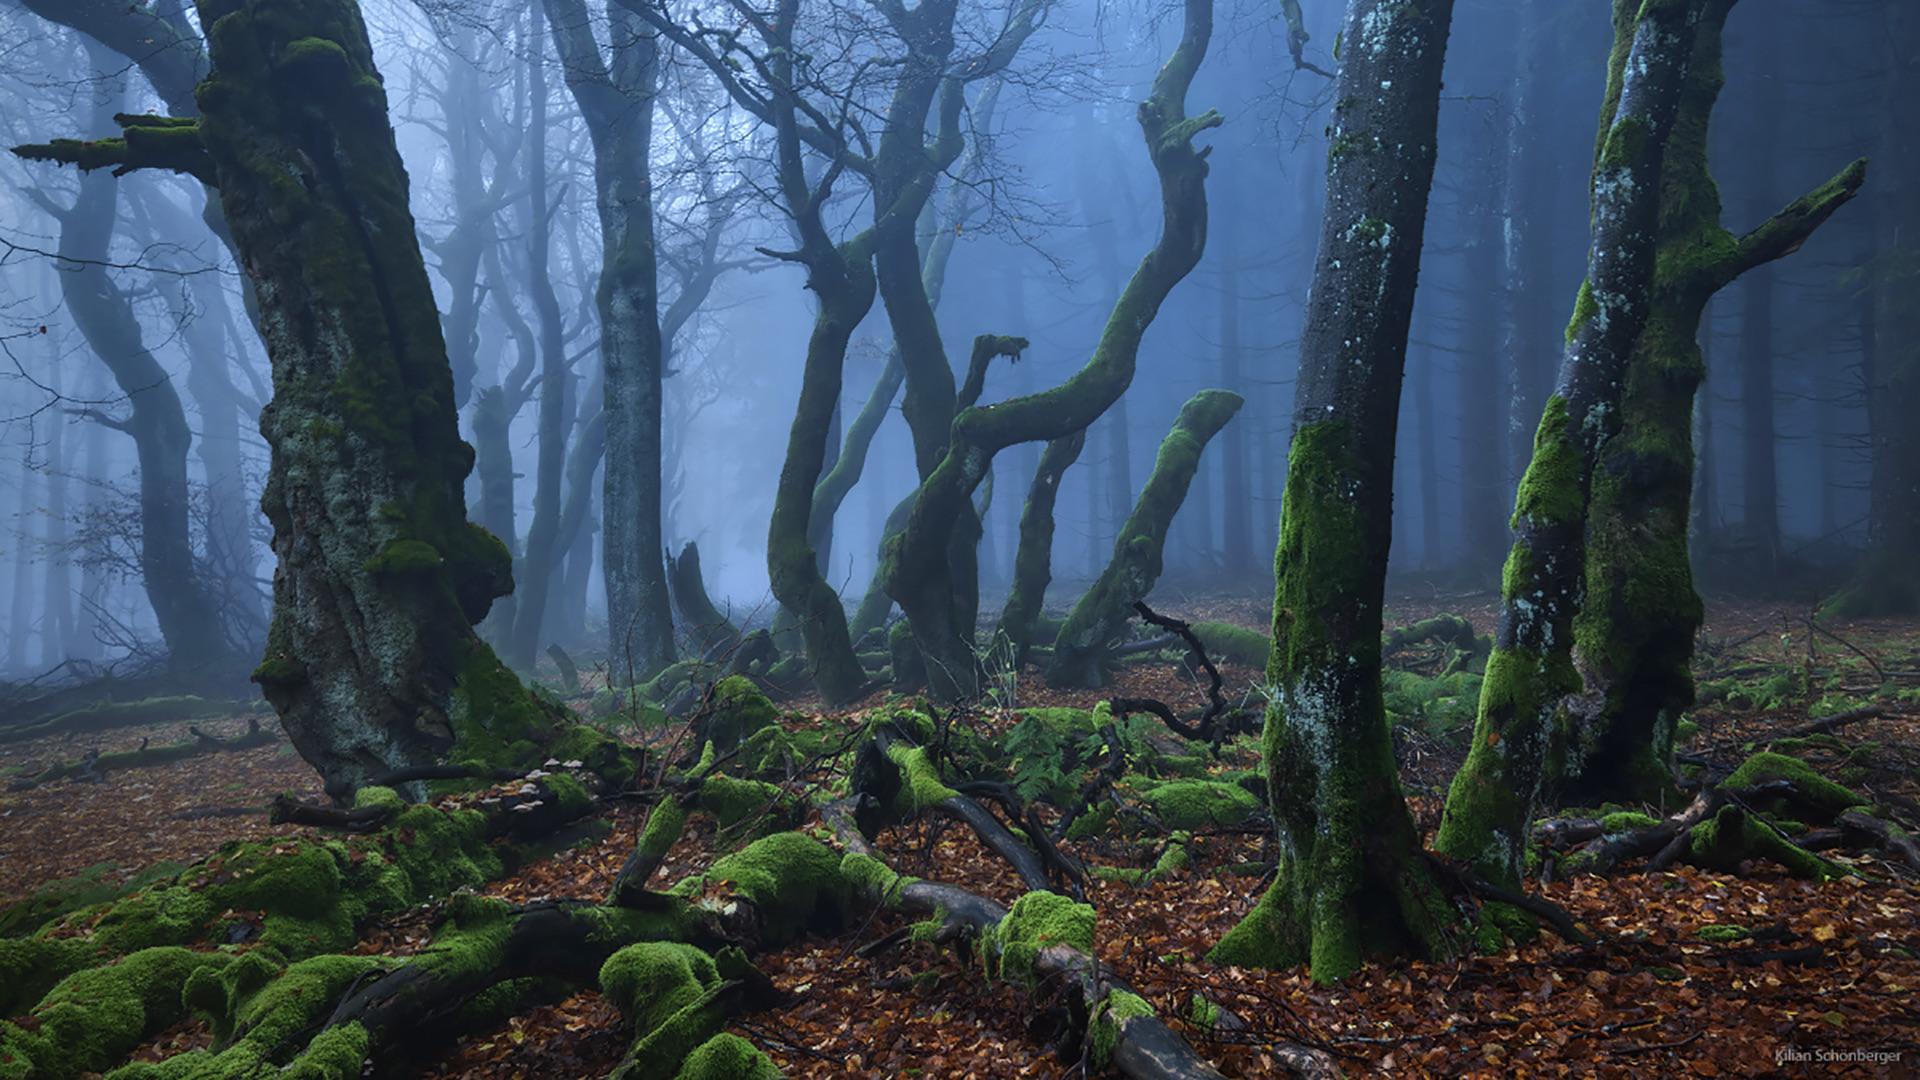 Landscape photos | 15 stunning landscape photos on 500px